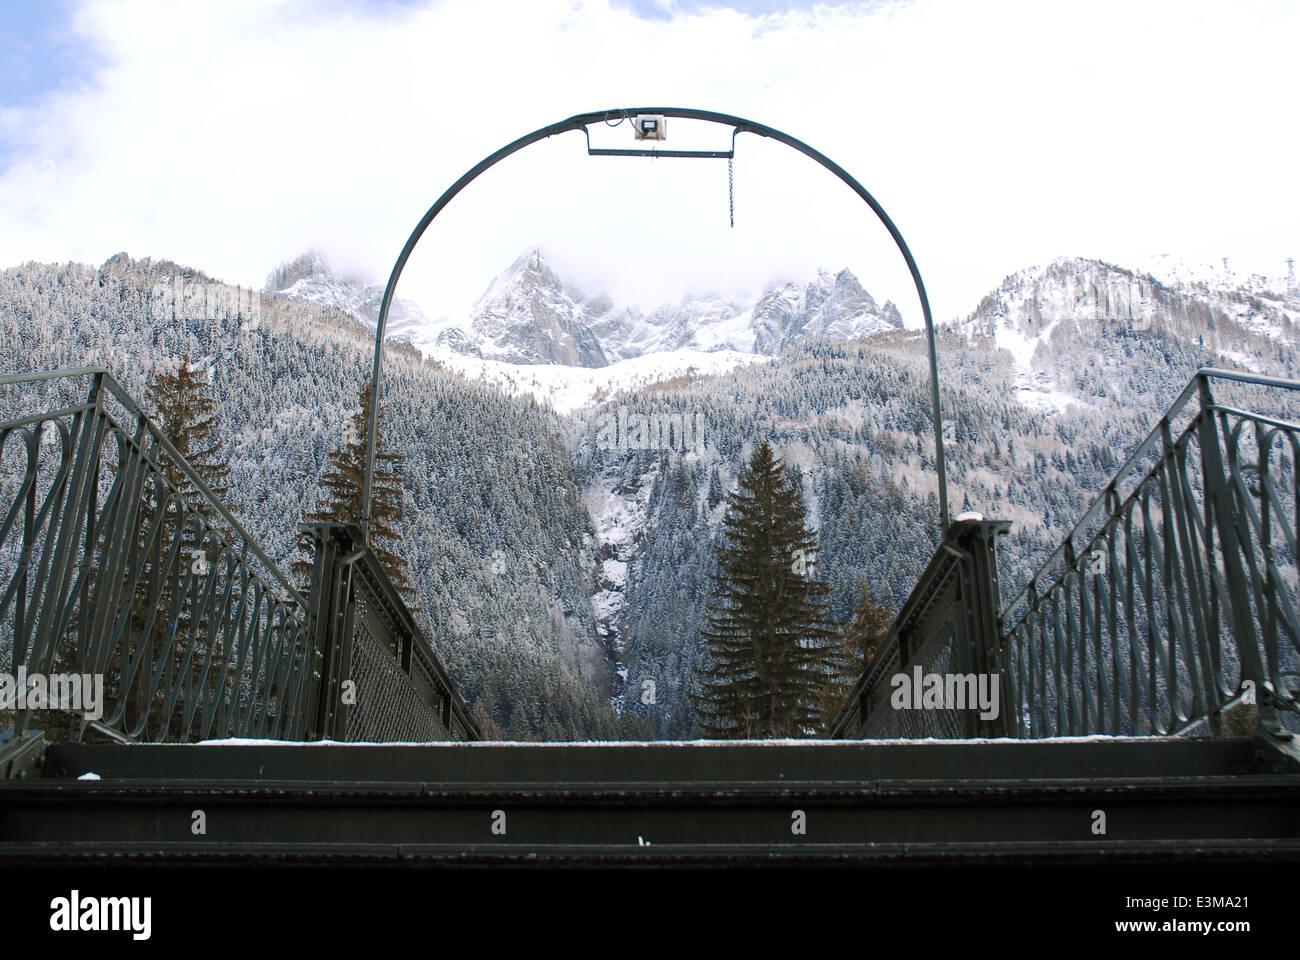 Pedestrian bridge in Chamonix, the French Alps - Stock Image